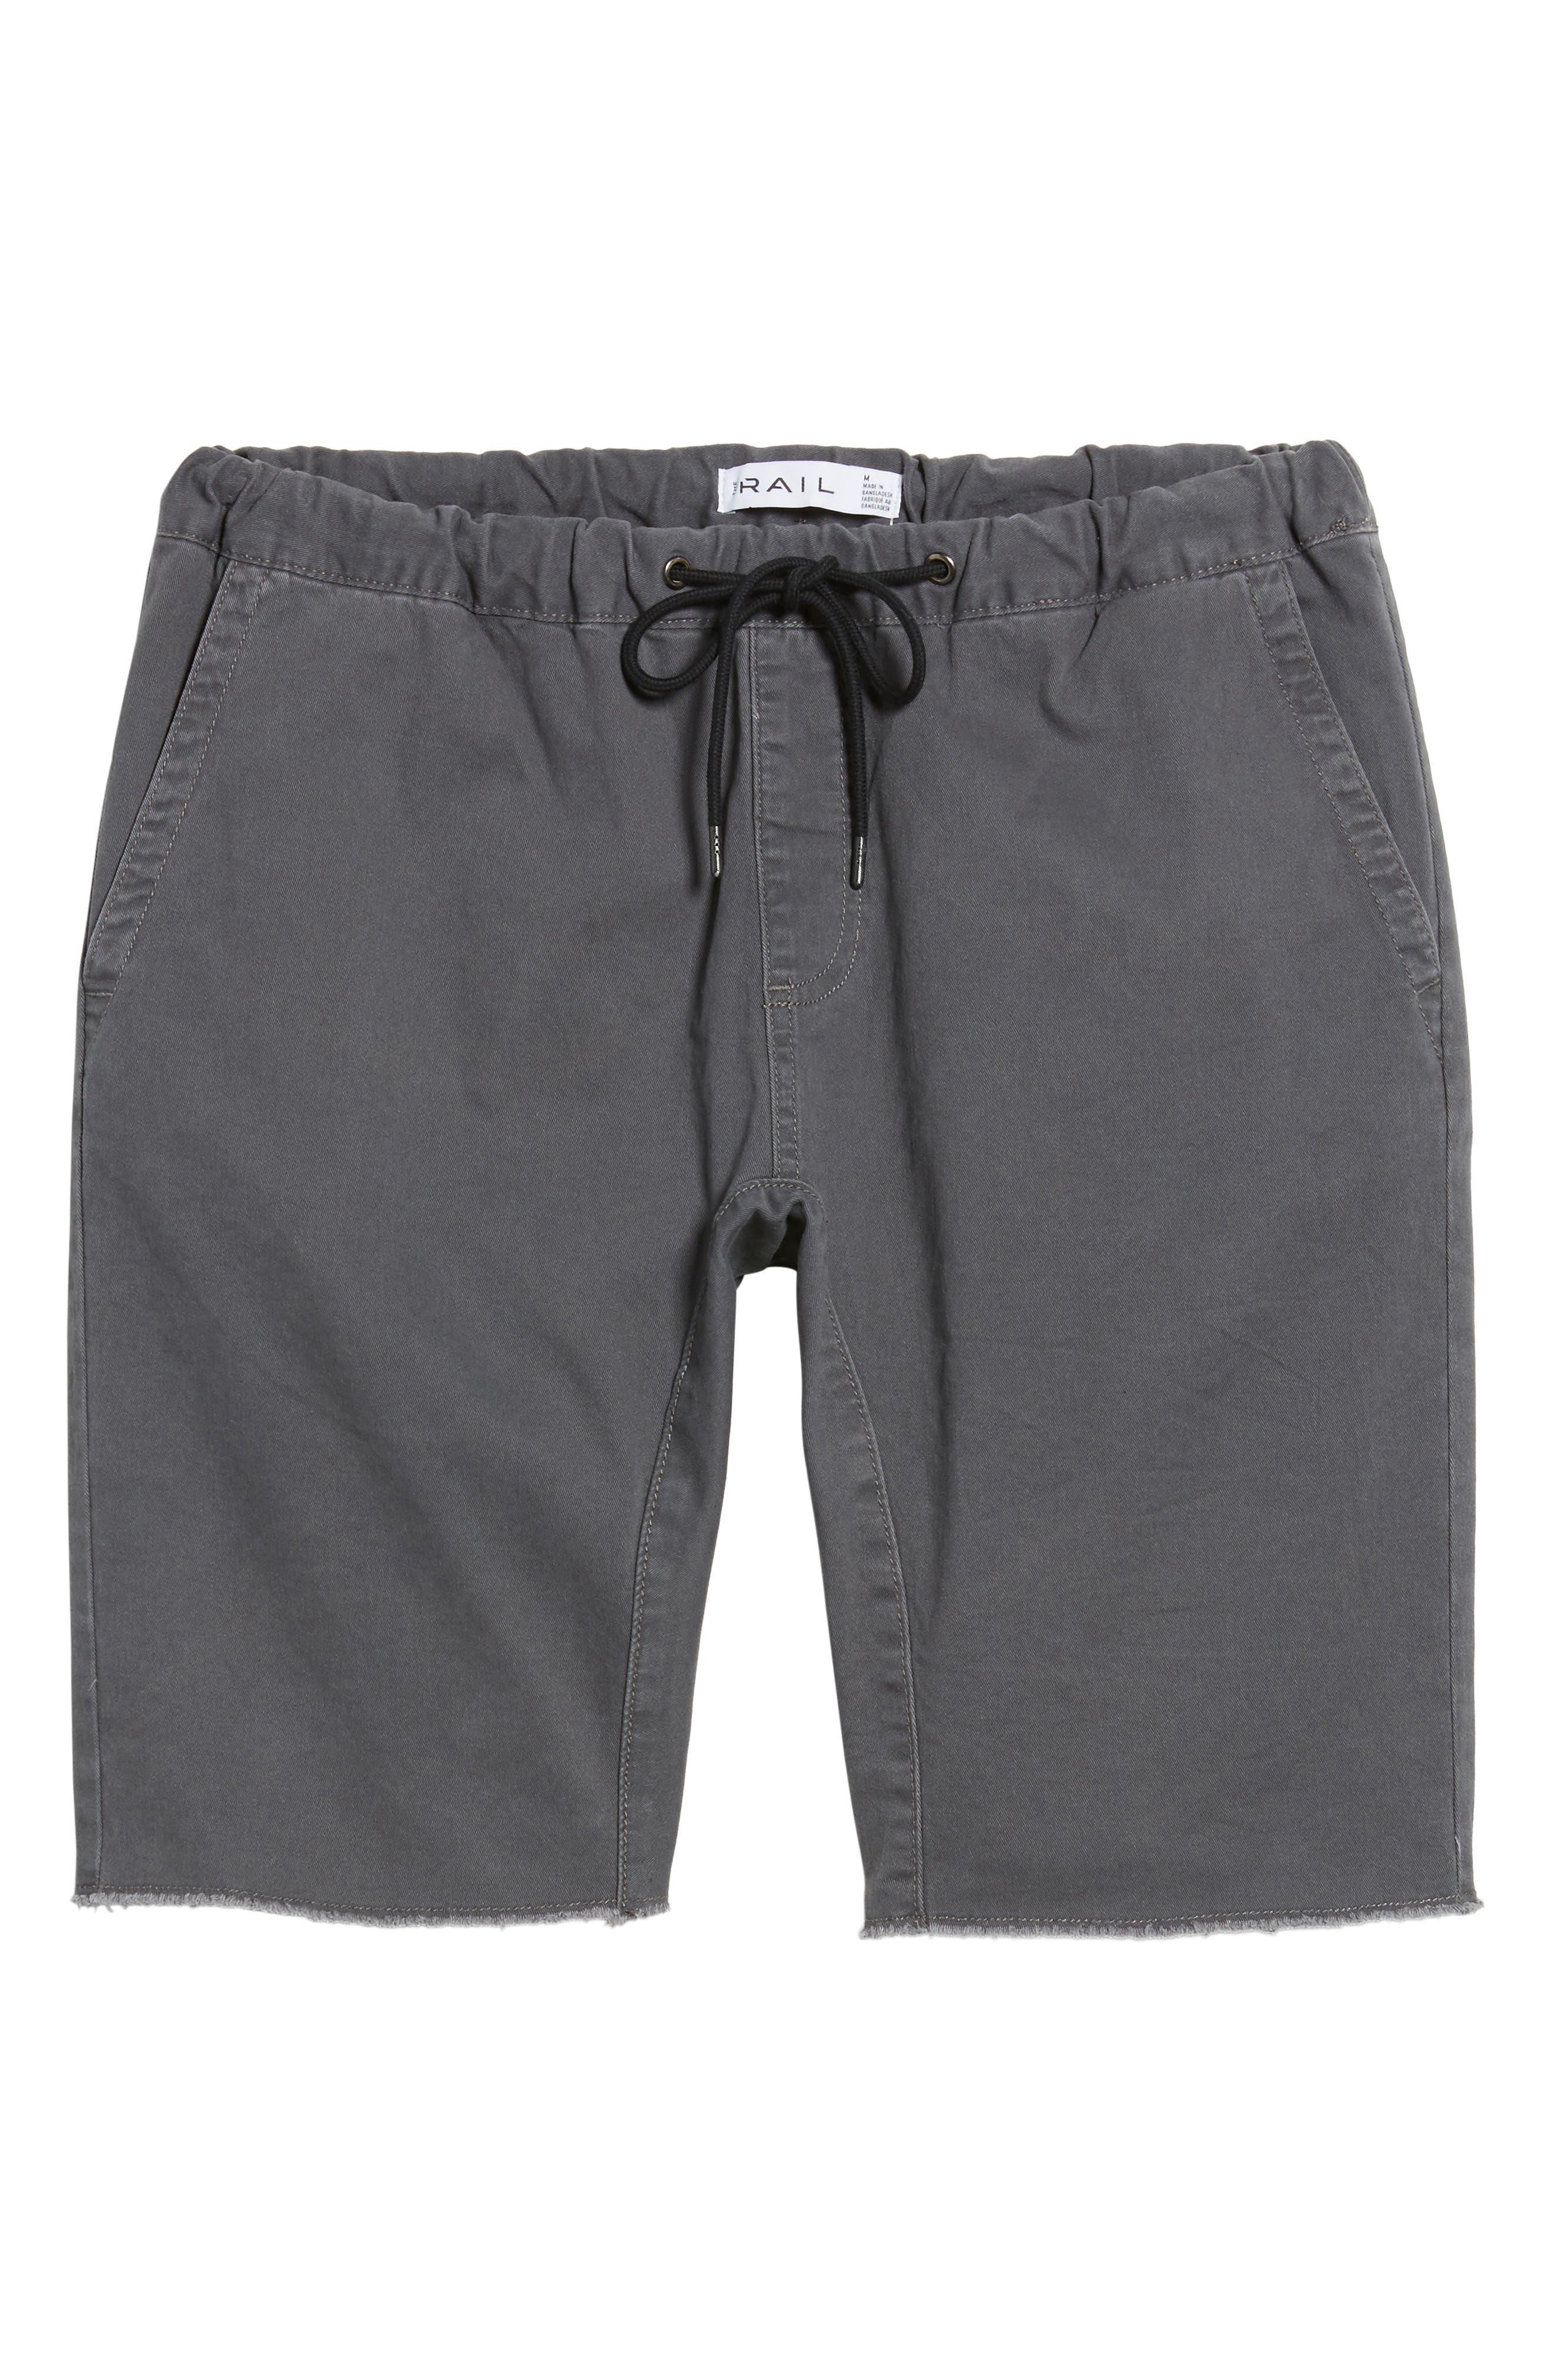 Jogger Shorts,                             Alternate thumbnail 6, color,                             GREY ONYX